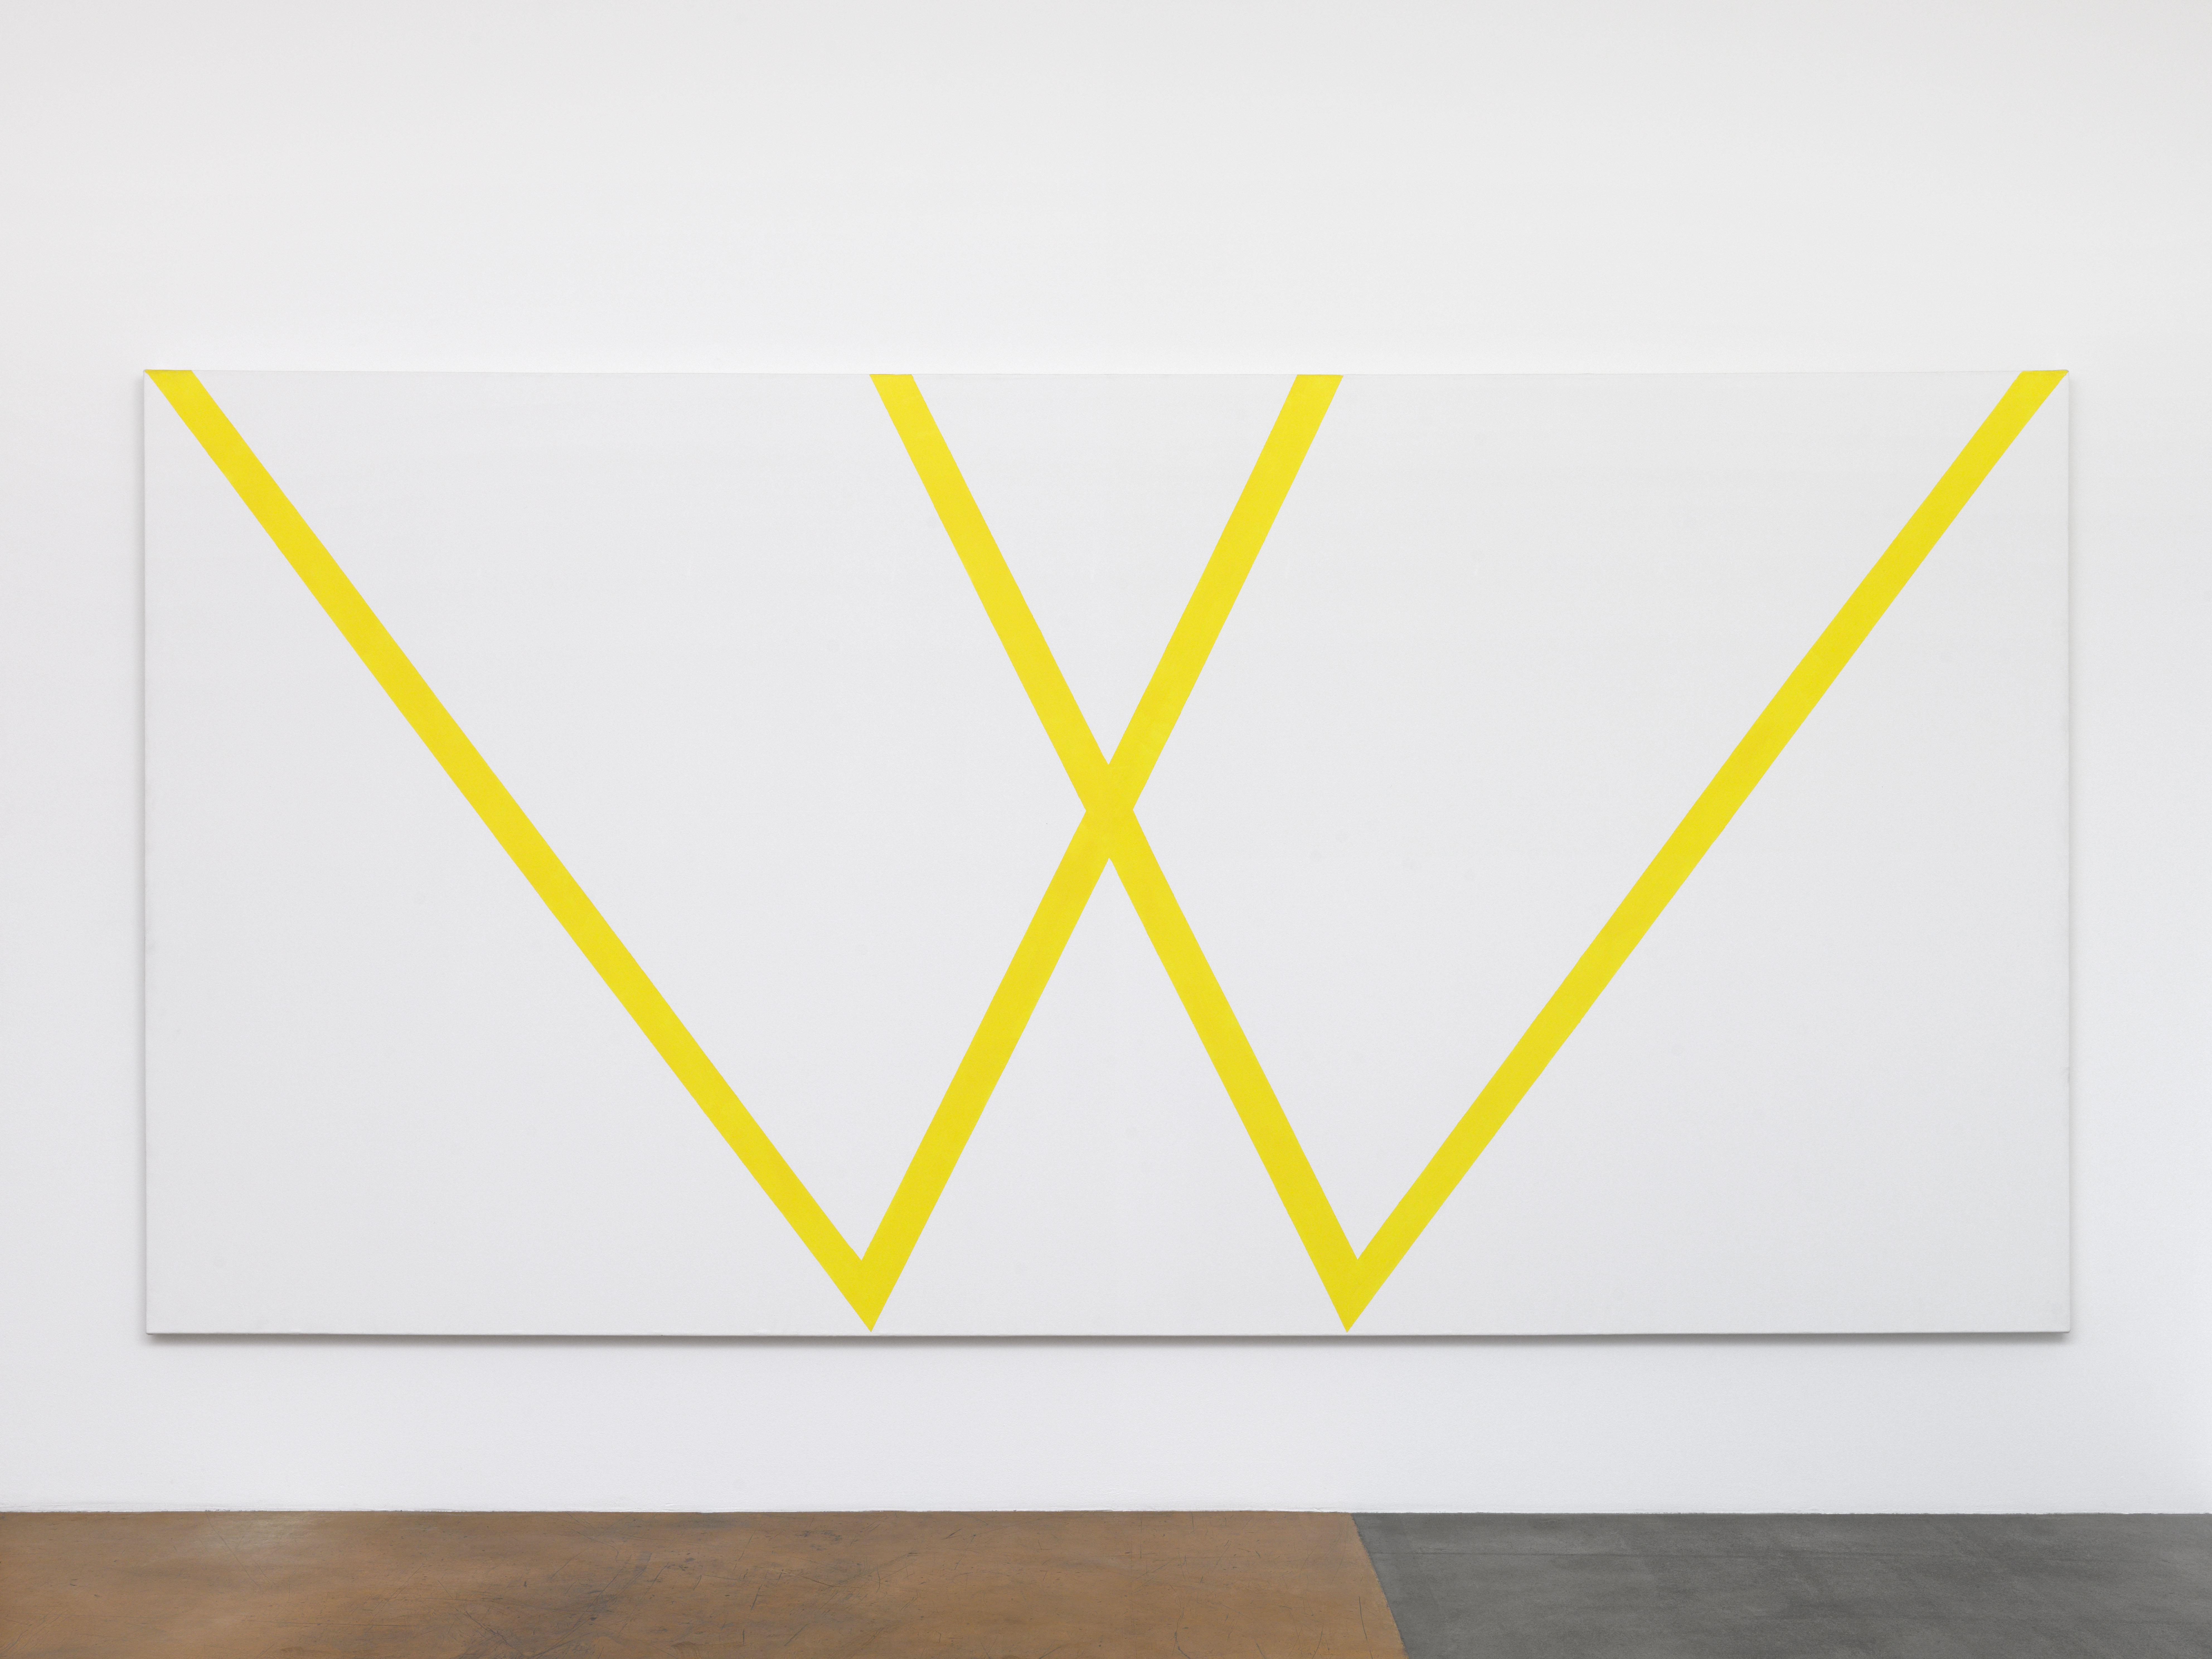 Olivier Mosset, Valuepack, 1986, acrylique sur toile, 210 x 420 cm / Photo credits: Annik Wetter–MAMCO Geneva